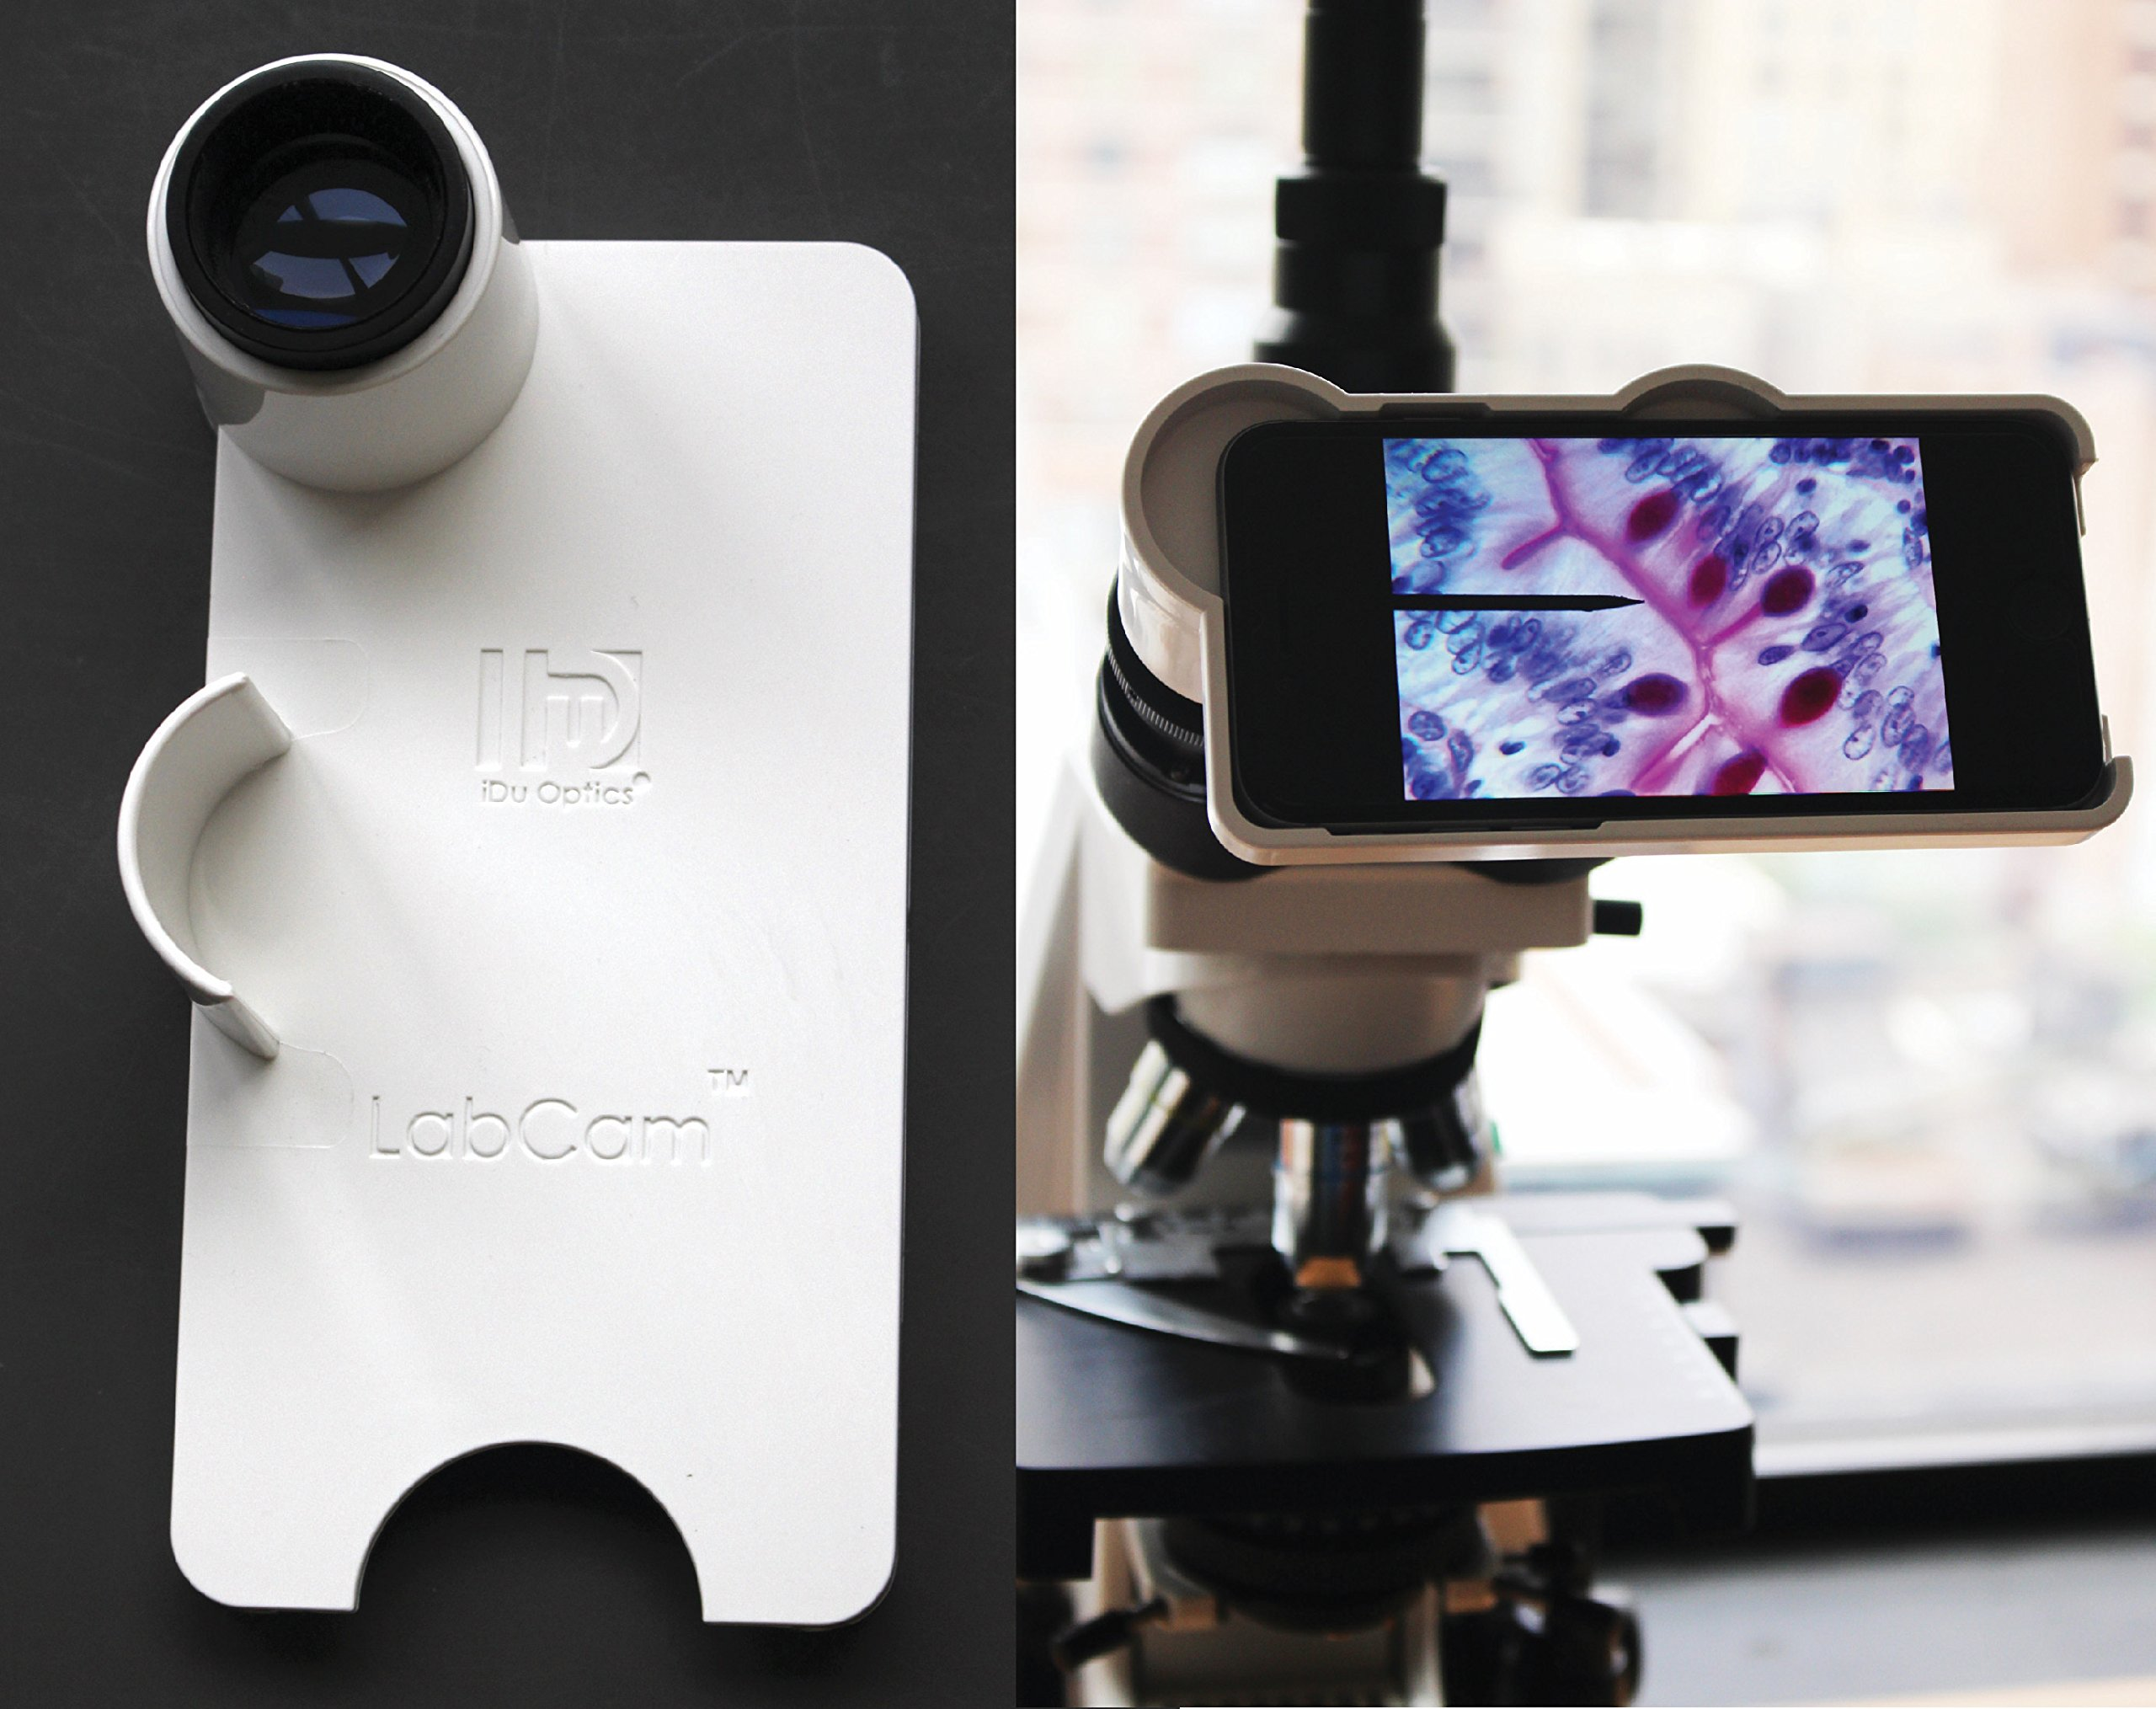 iDu LabCam Microscope Adapter for iPhone 7/8 Plus